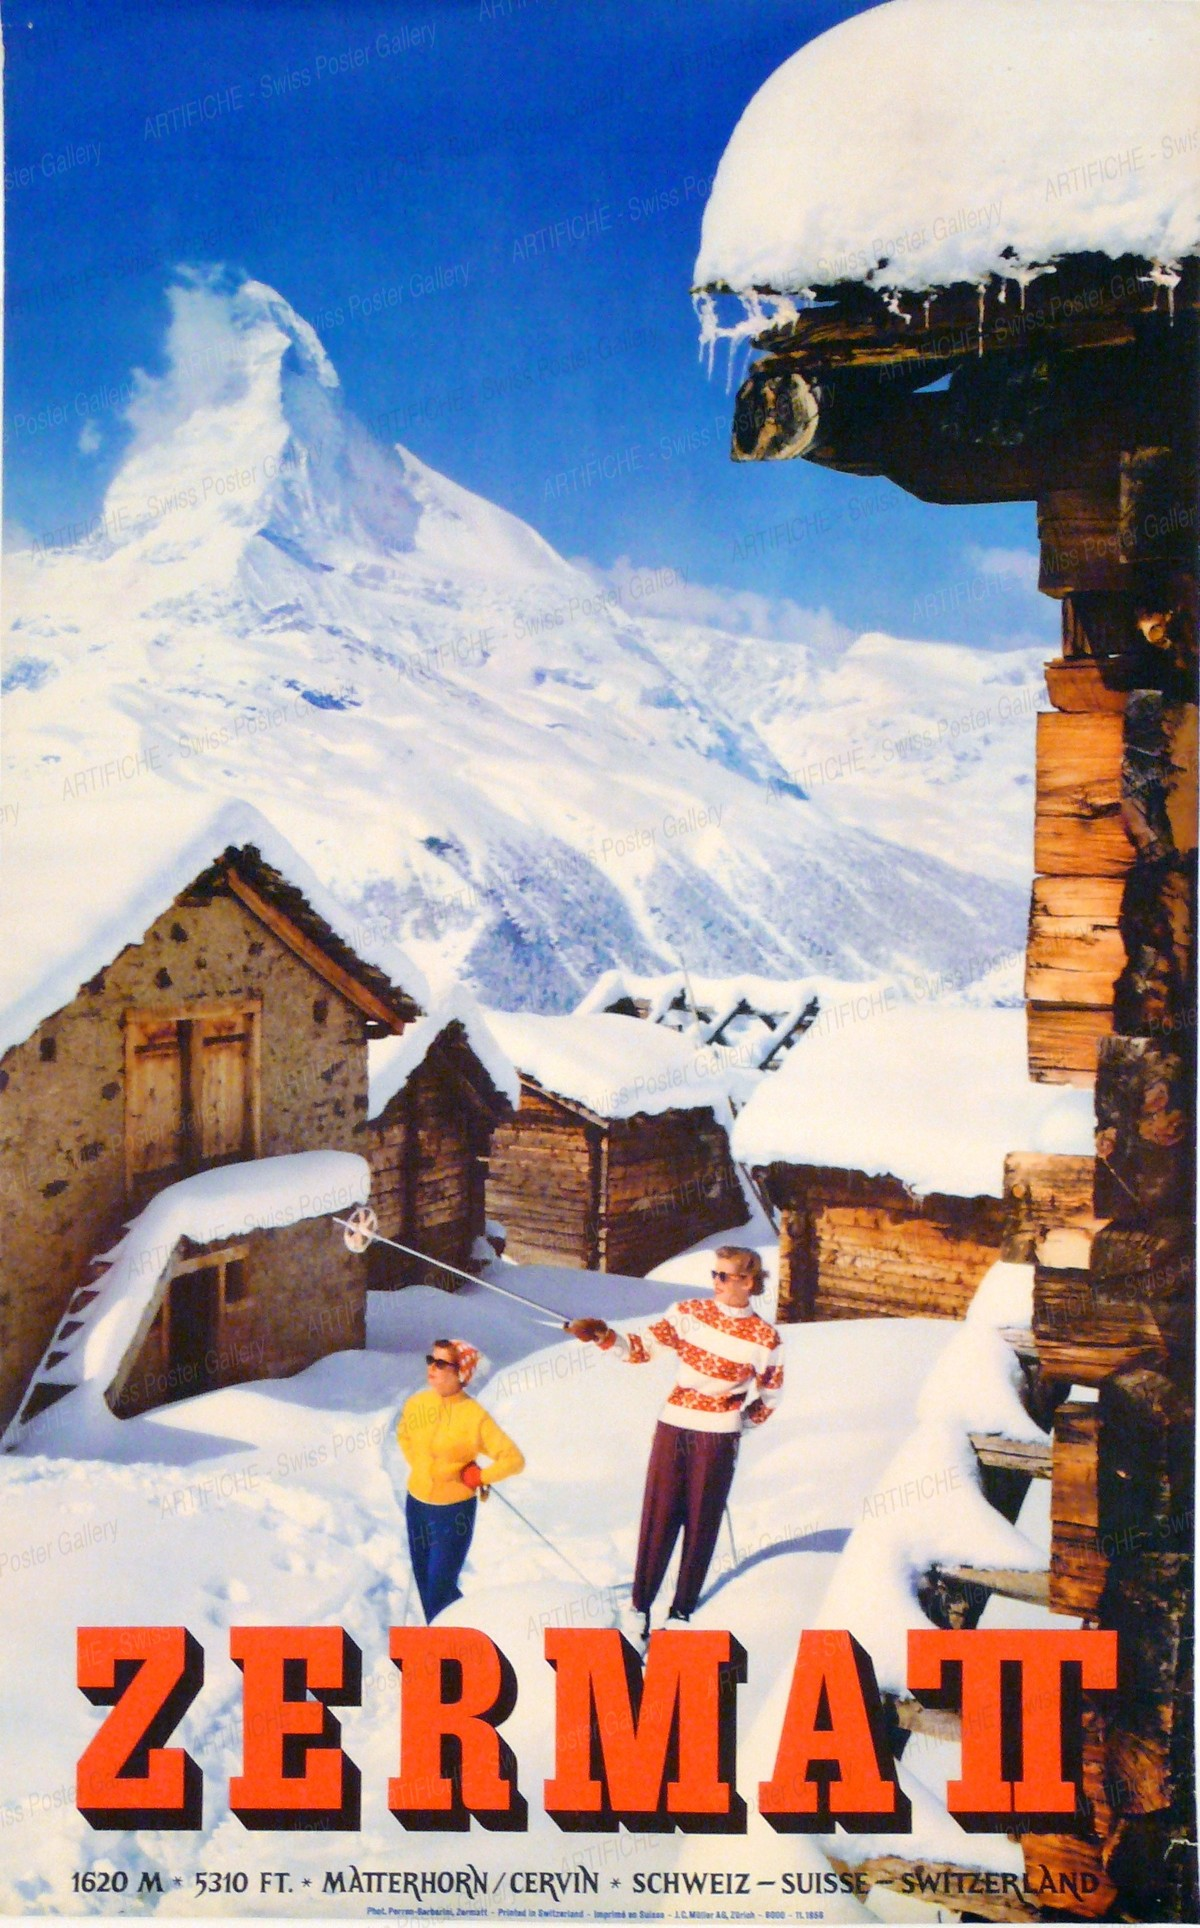 ZERMATT – 1620 m. 5310 ft. Matterhorn, Alfred Perren-Barberini